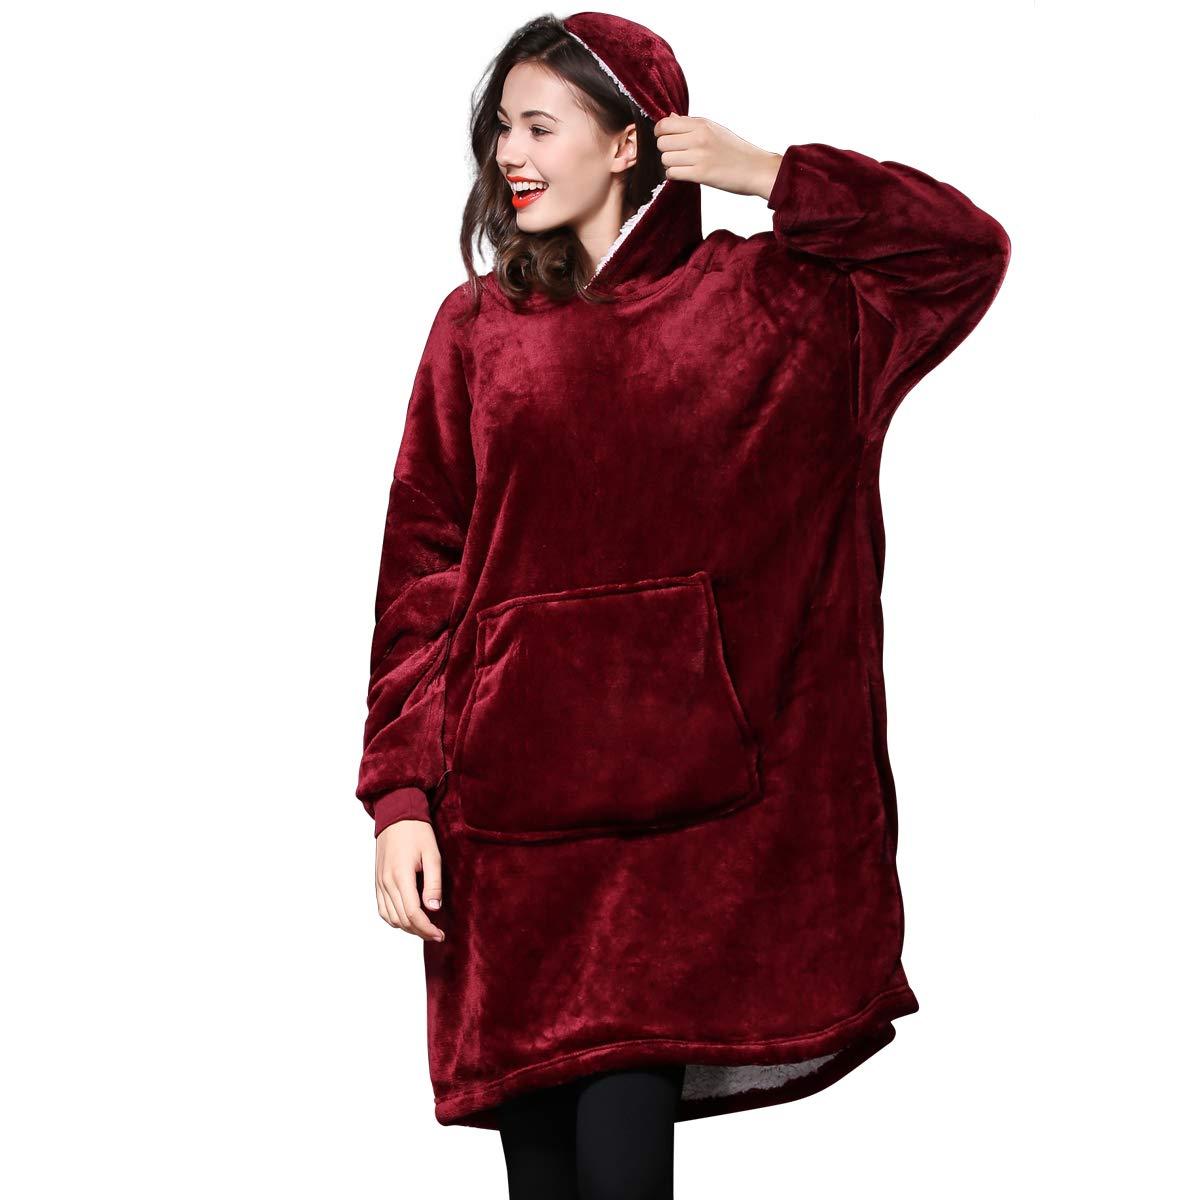 ACCLOVE Lazy Huggle Hoodie Wearable Blanket Ultra Plush Blankets Hoodie Head TV Blanket- One Size Fit Adult Men Women for Winter Home As Seen on TV(Burgundy)